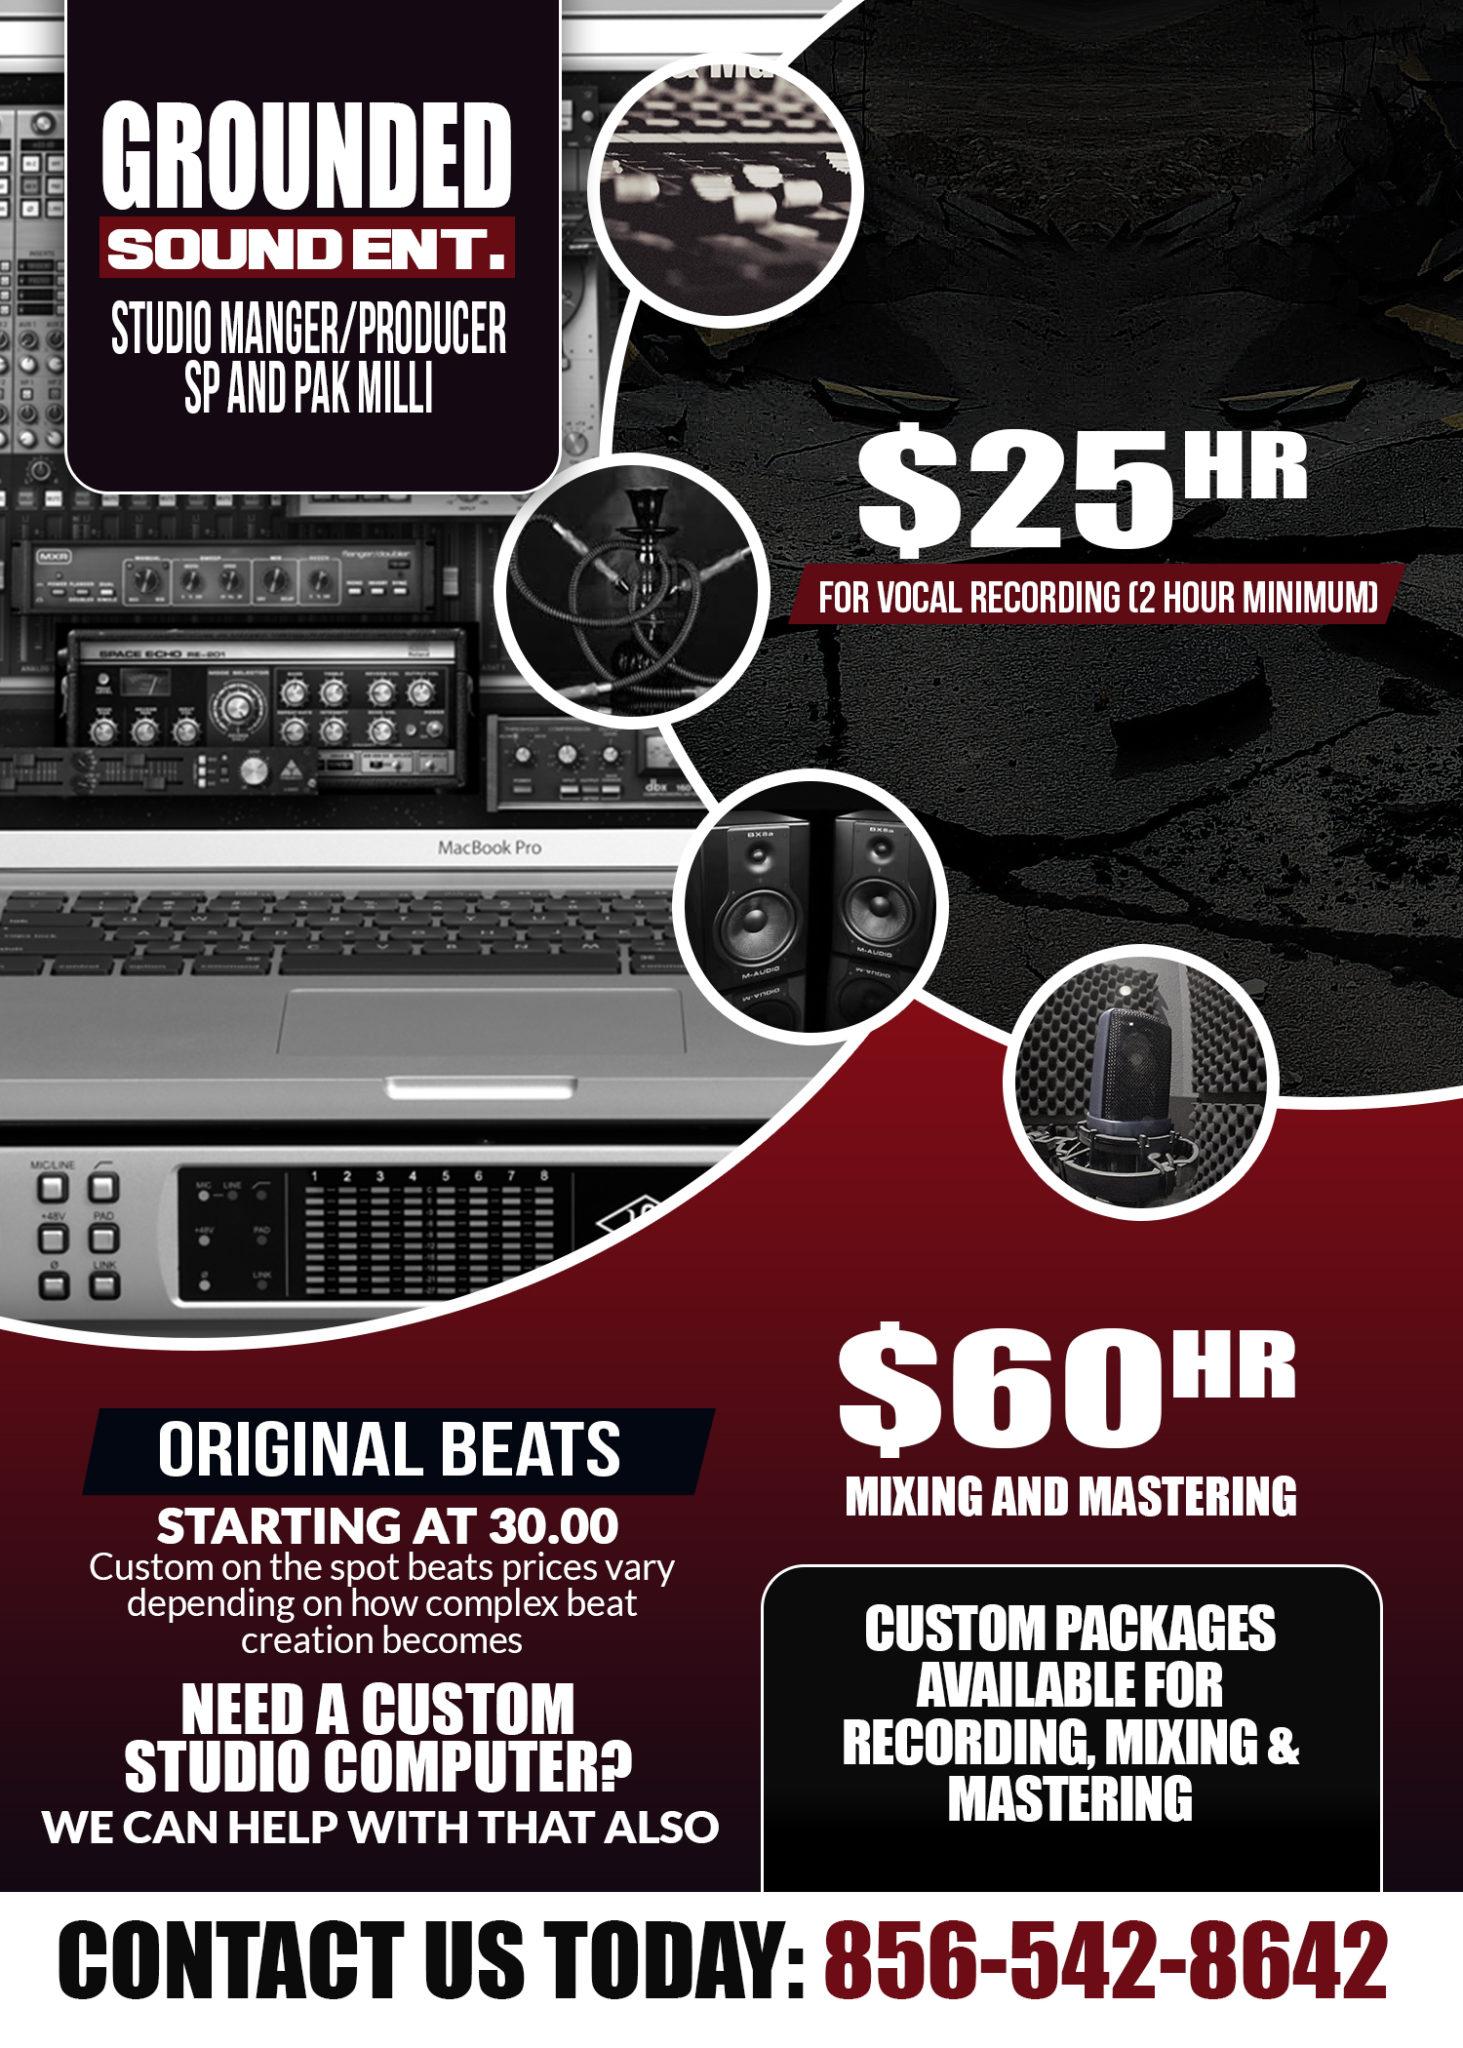 Ground Sound Studio MixtapeCoversnet